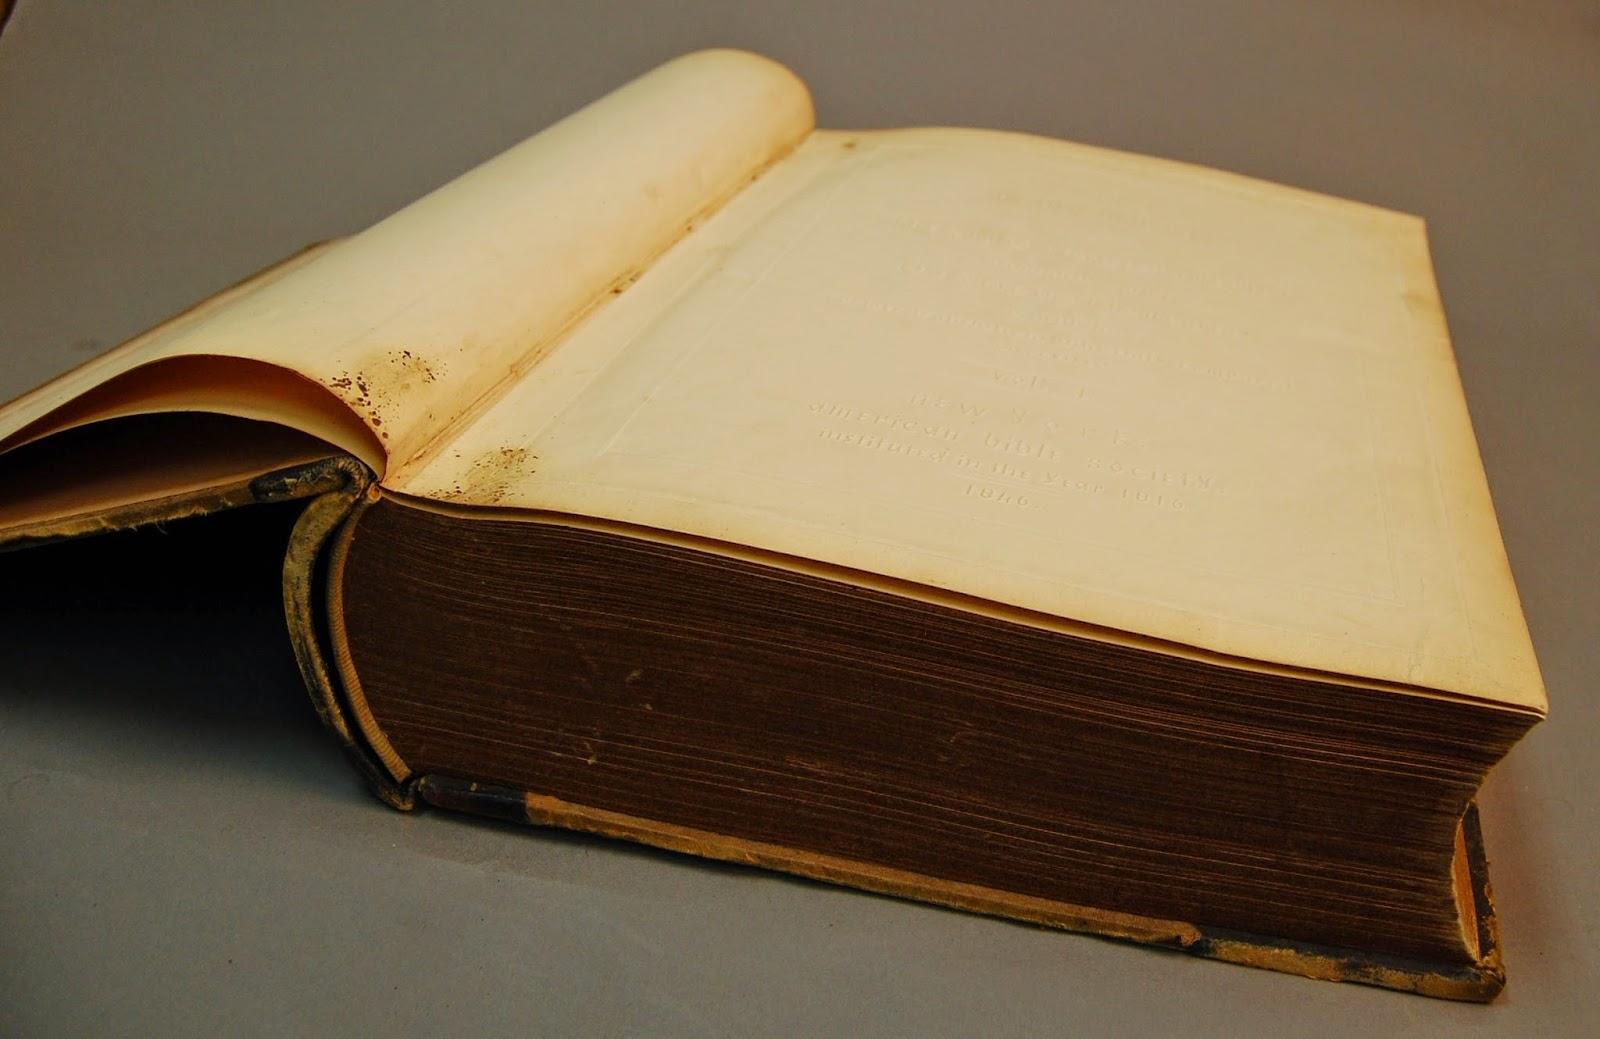 1846 American Bible Society Bible